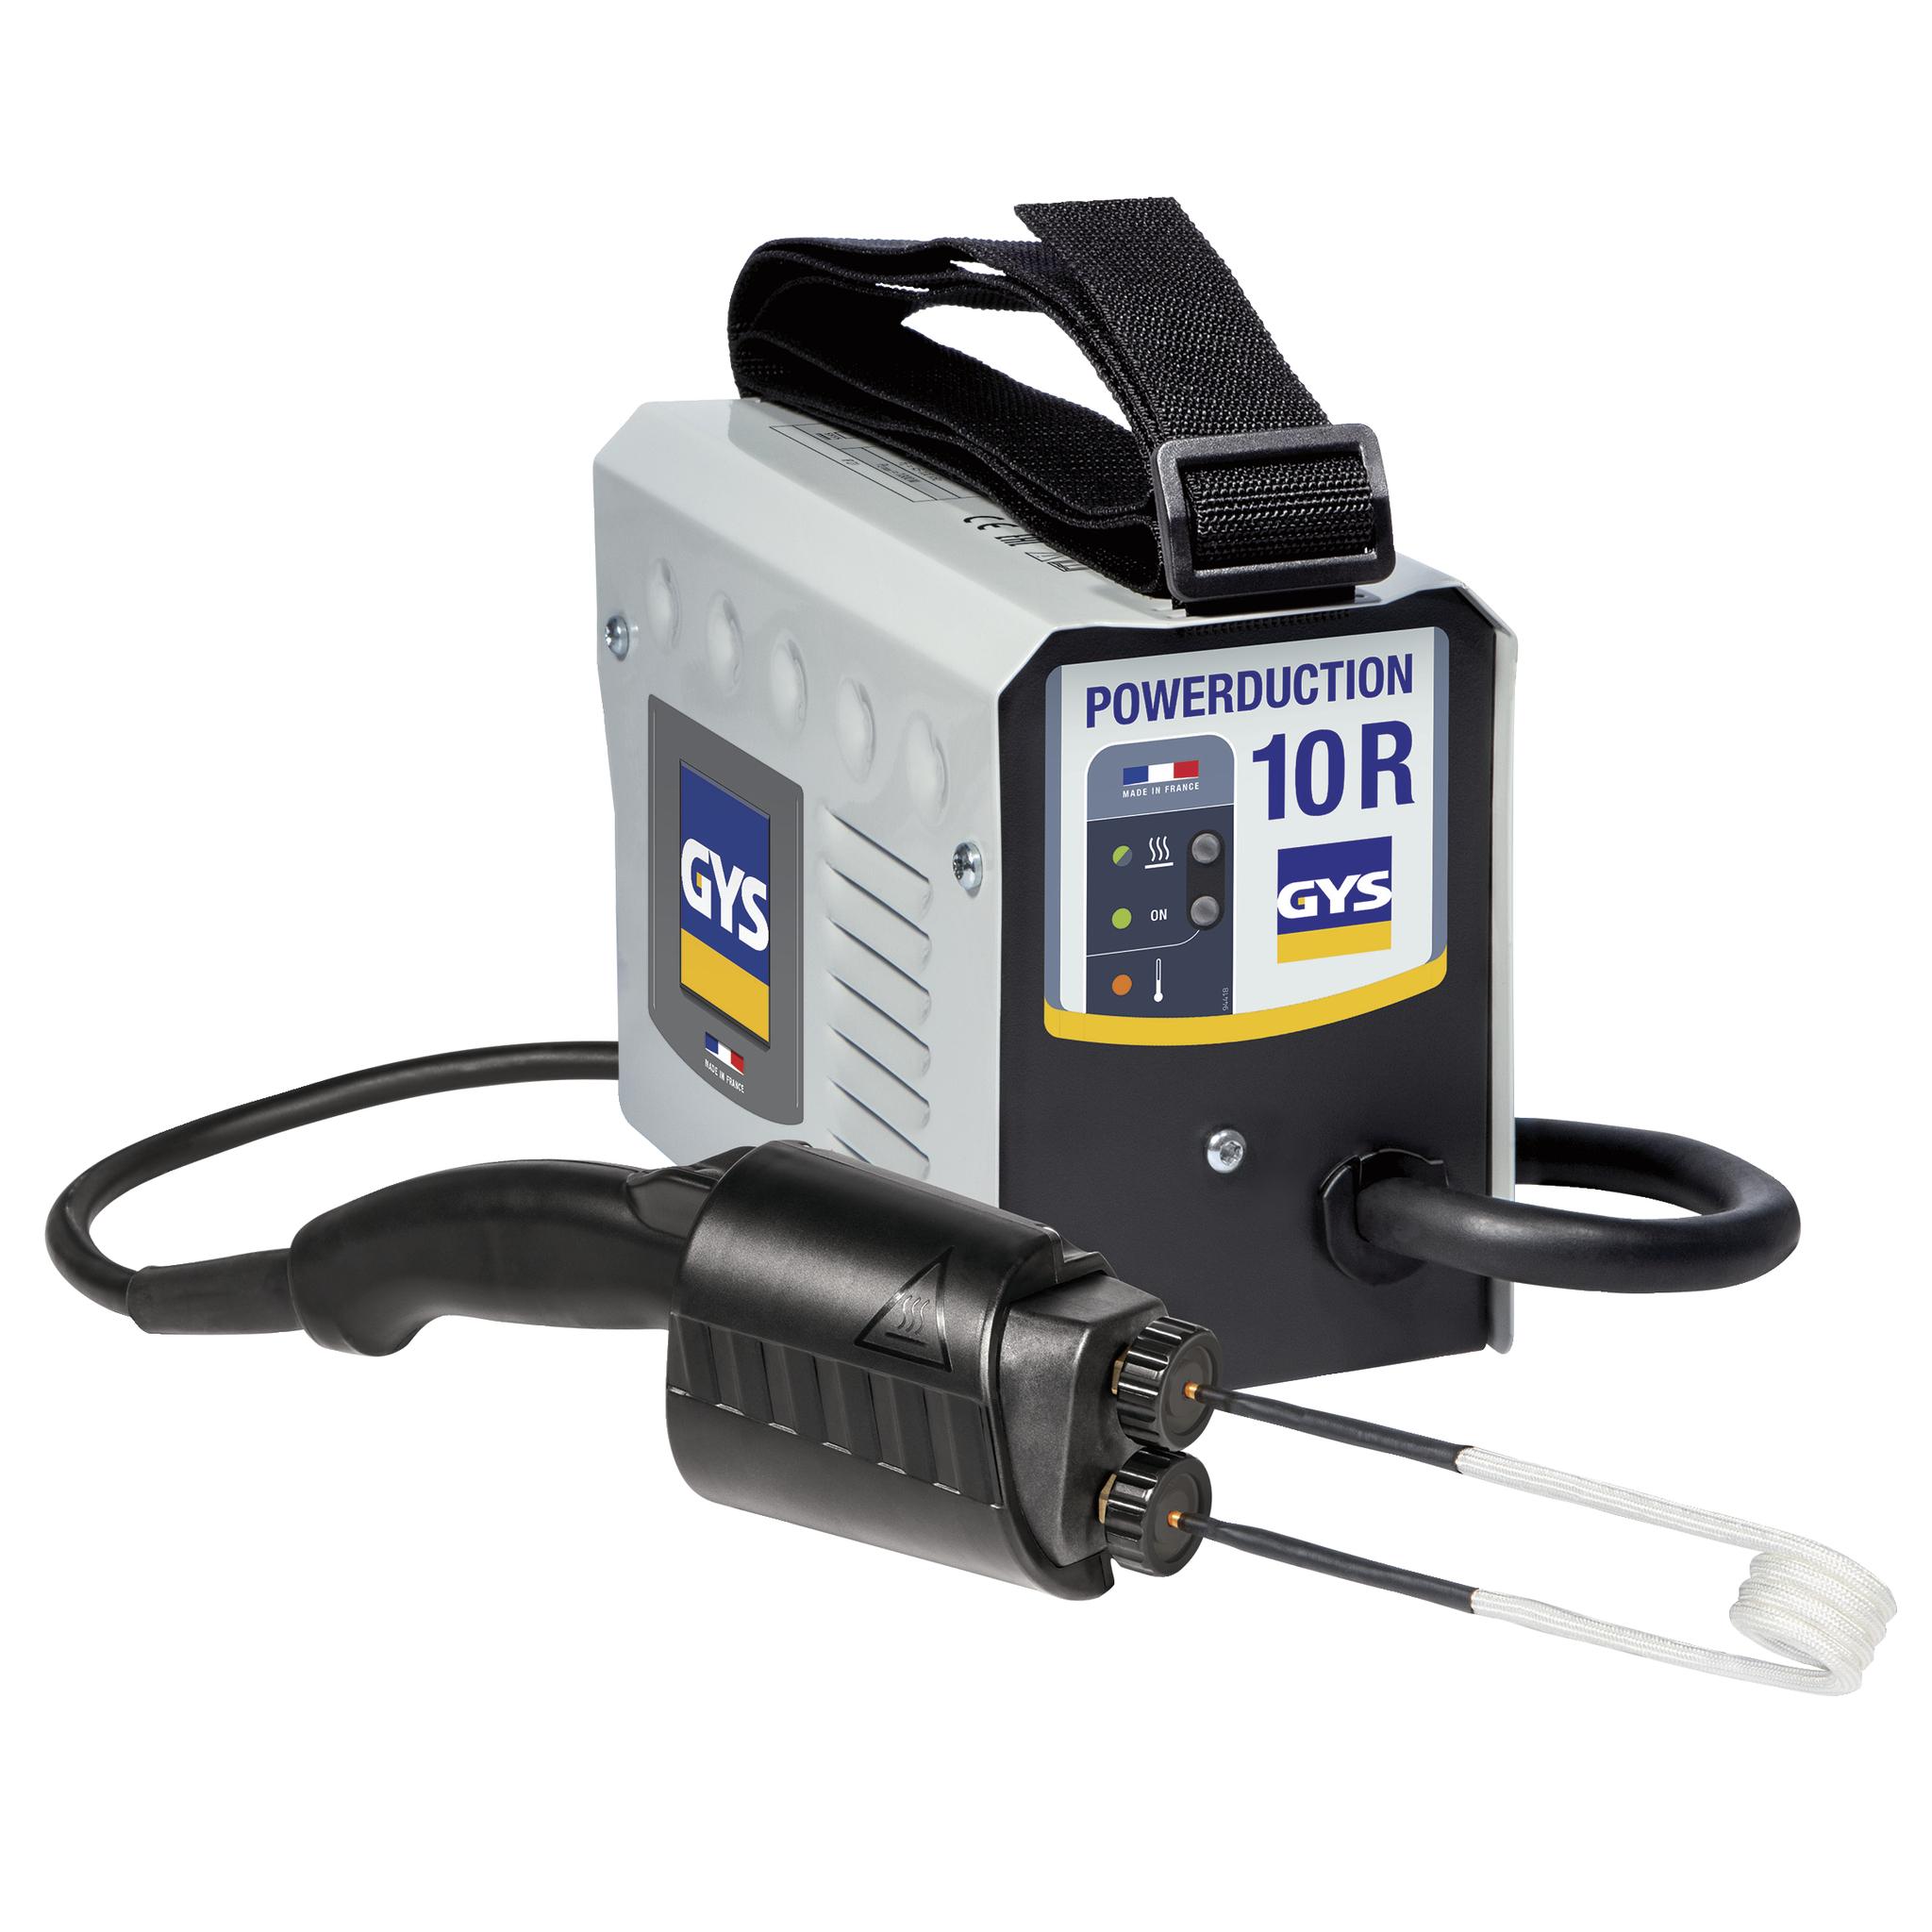 POWERDUCTION GYS 10R 1200W